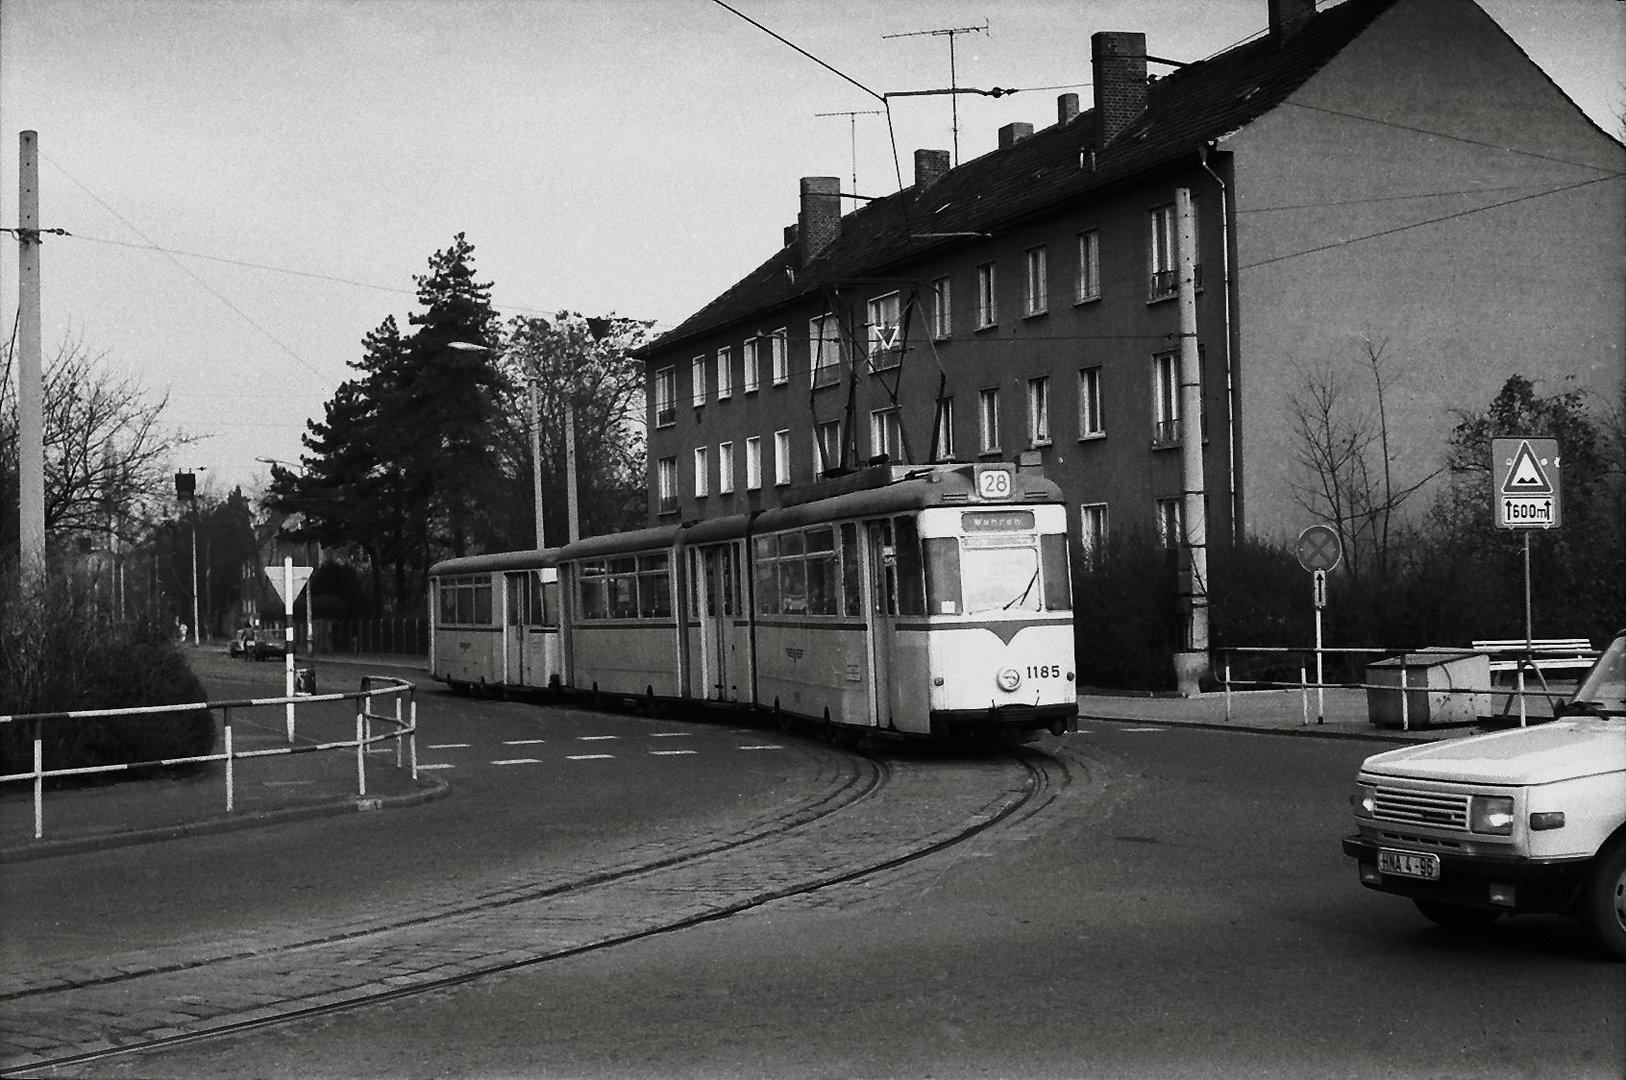 1185 in Markleeberg